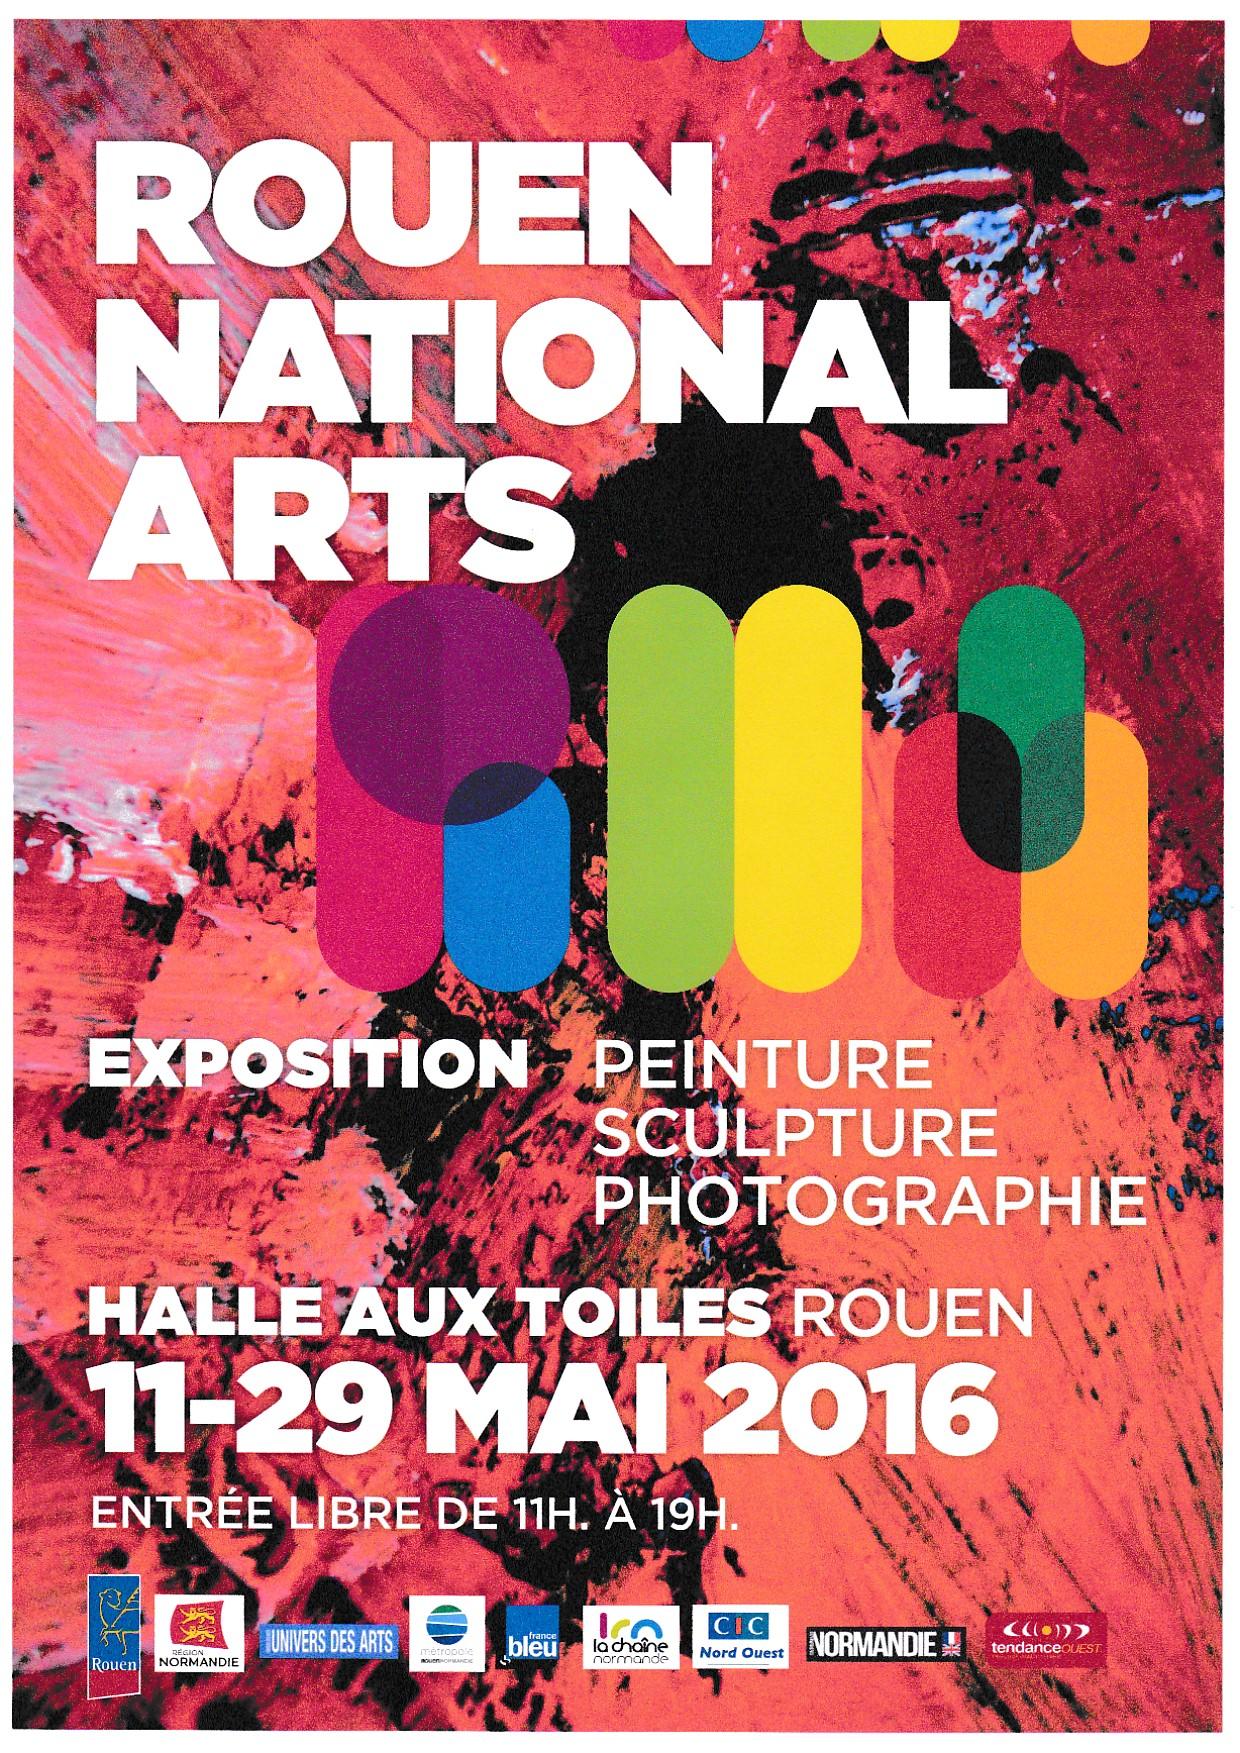 Affiche Rouen_20160407_0001